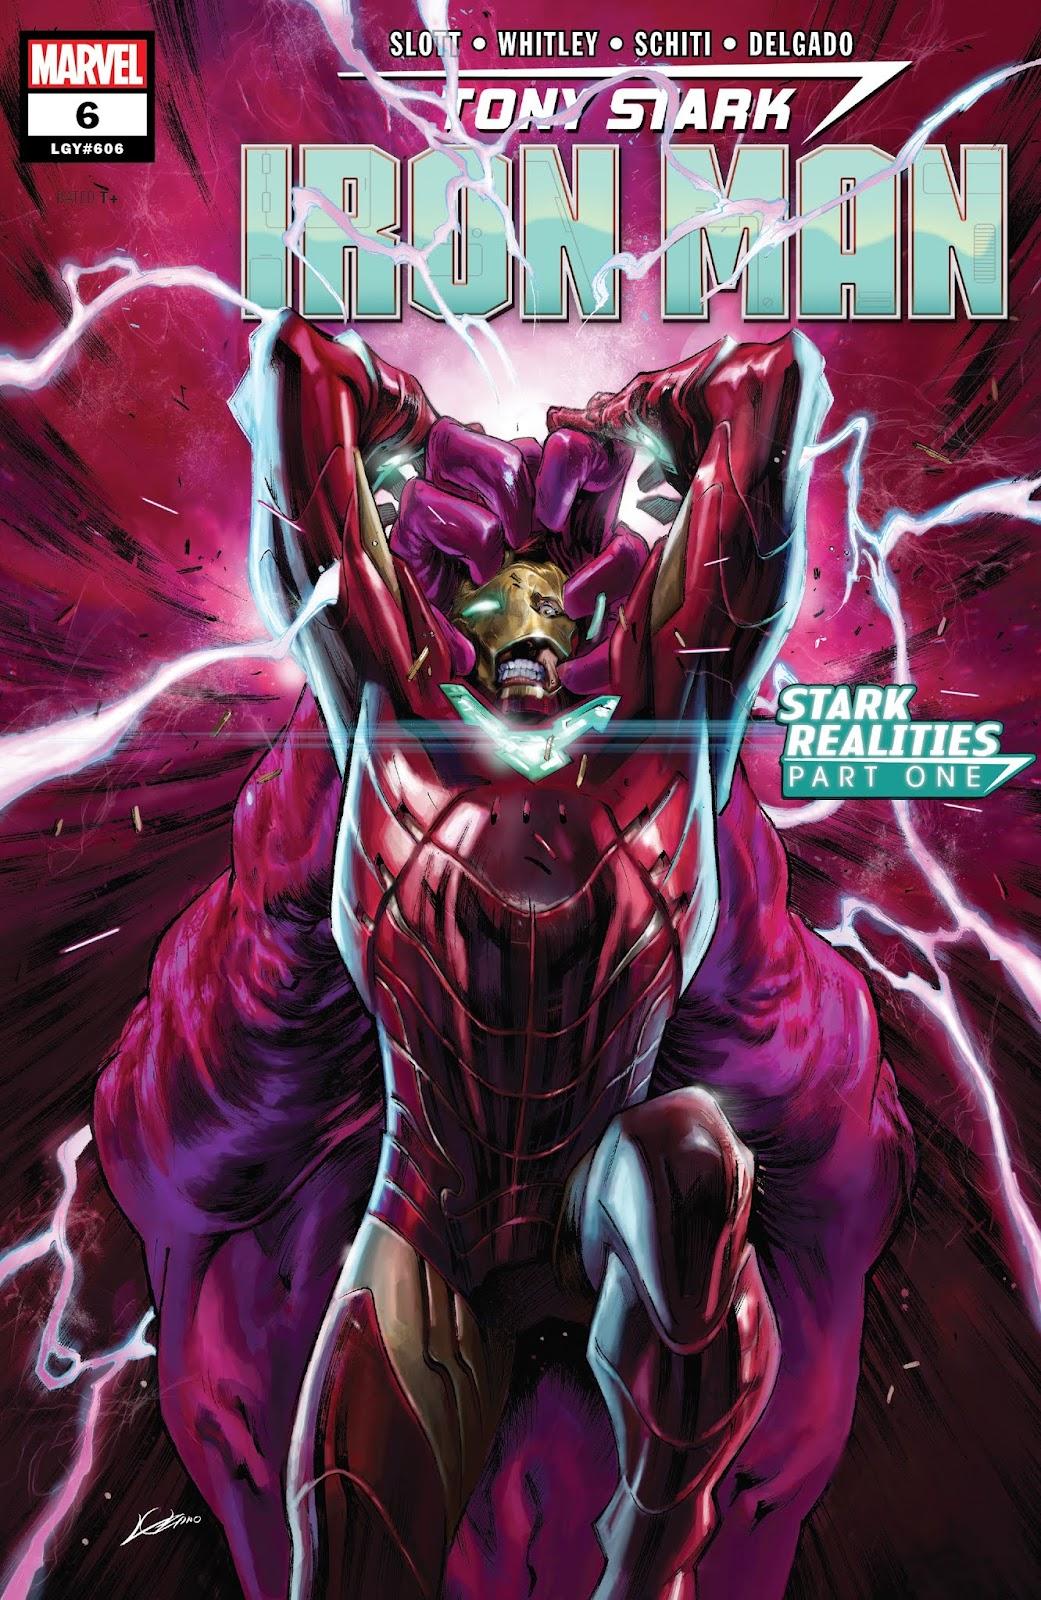 Read online Tony Stark: Iron Man comic -  Issue #6 - 1